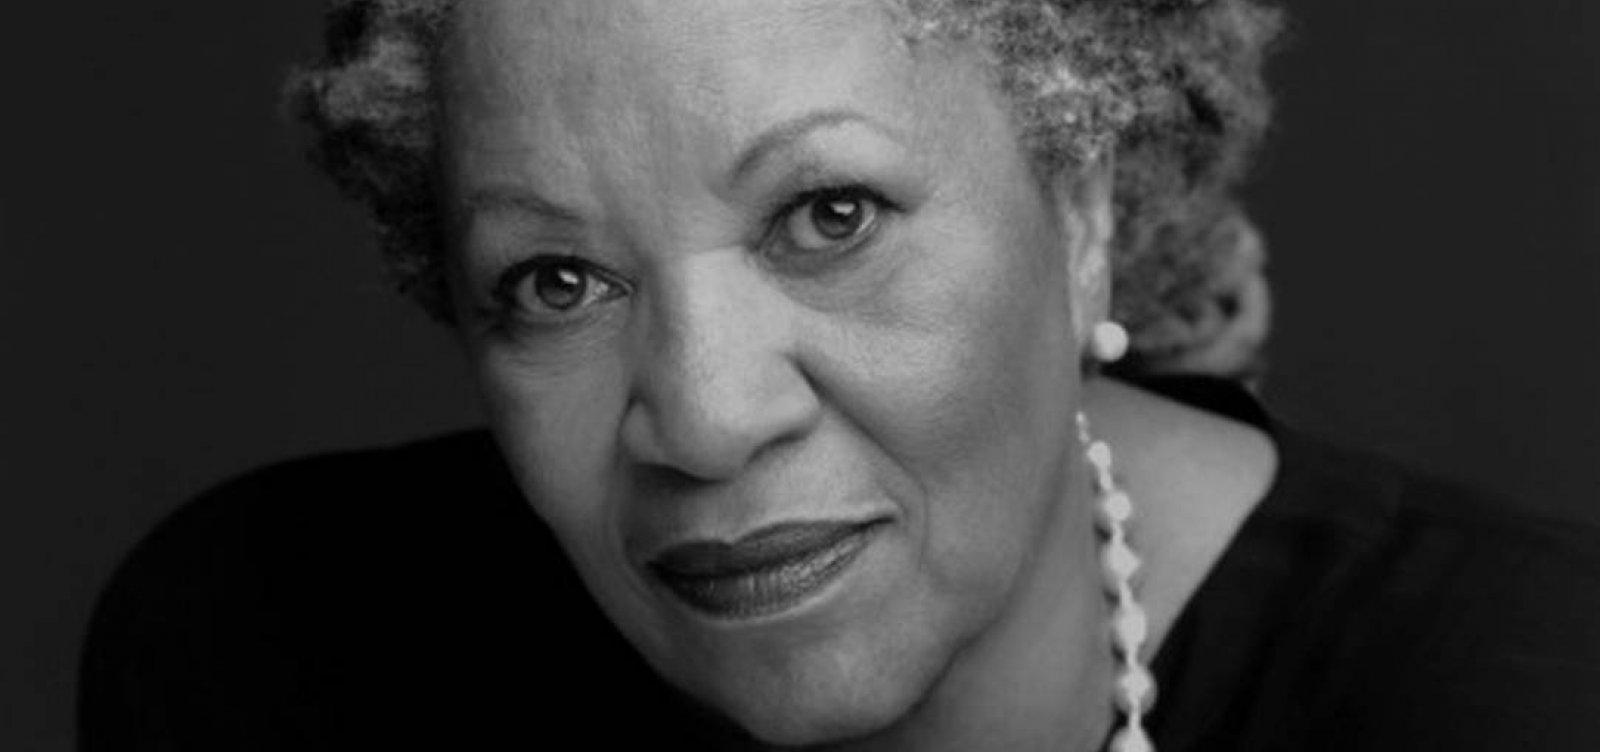 [Morre Toni Morrison, prêmio Nobel de Literatura]